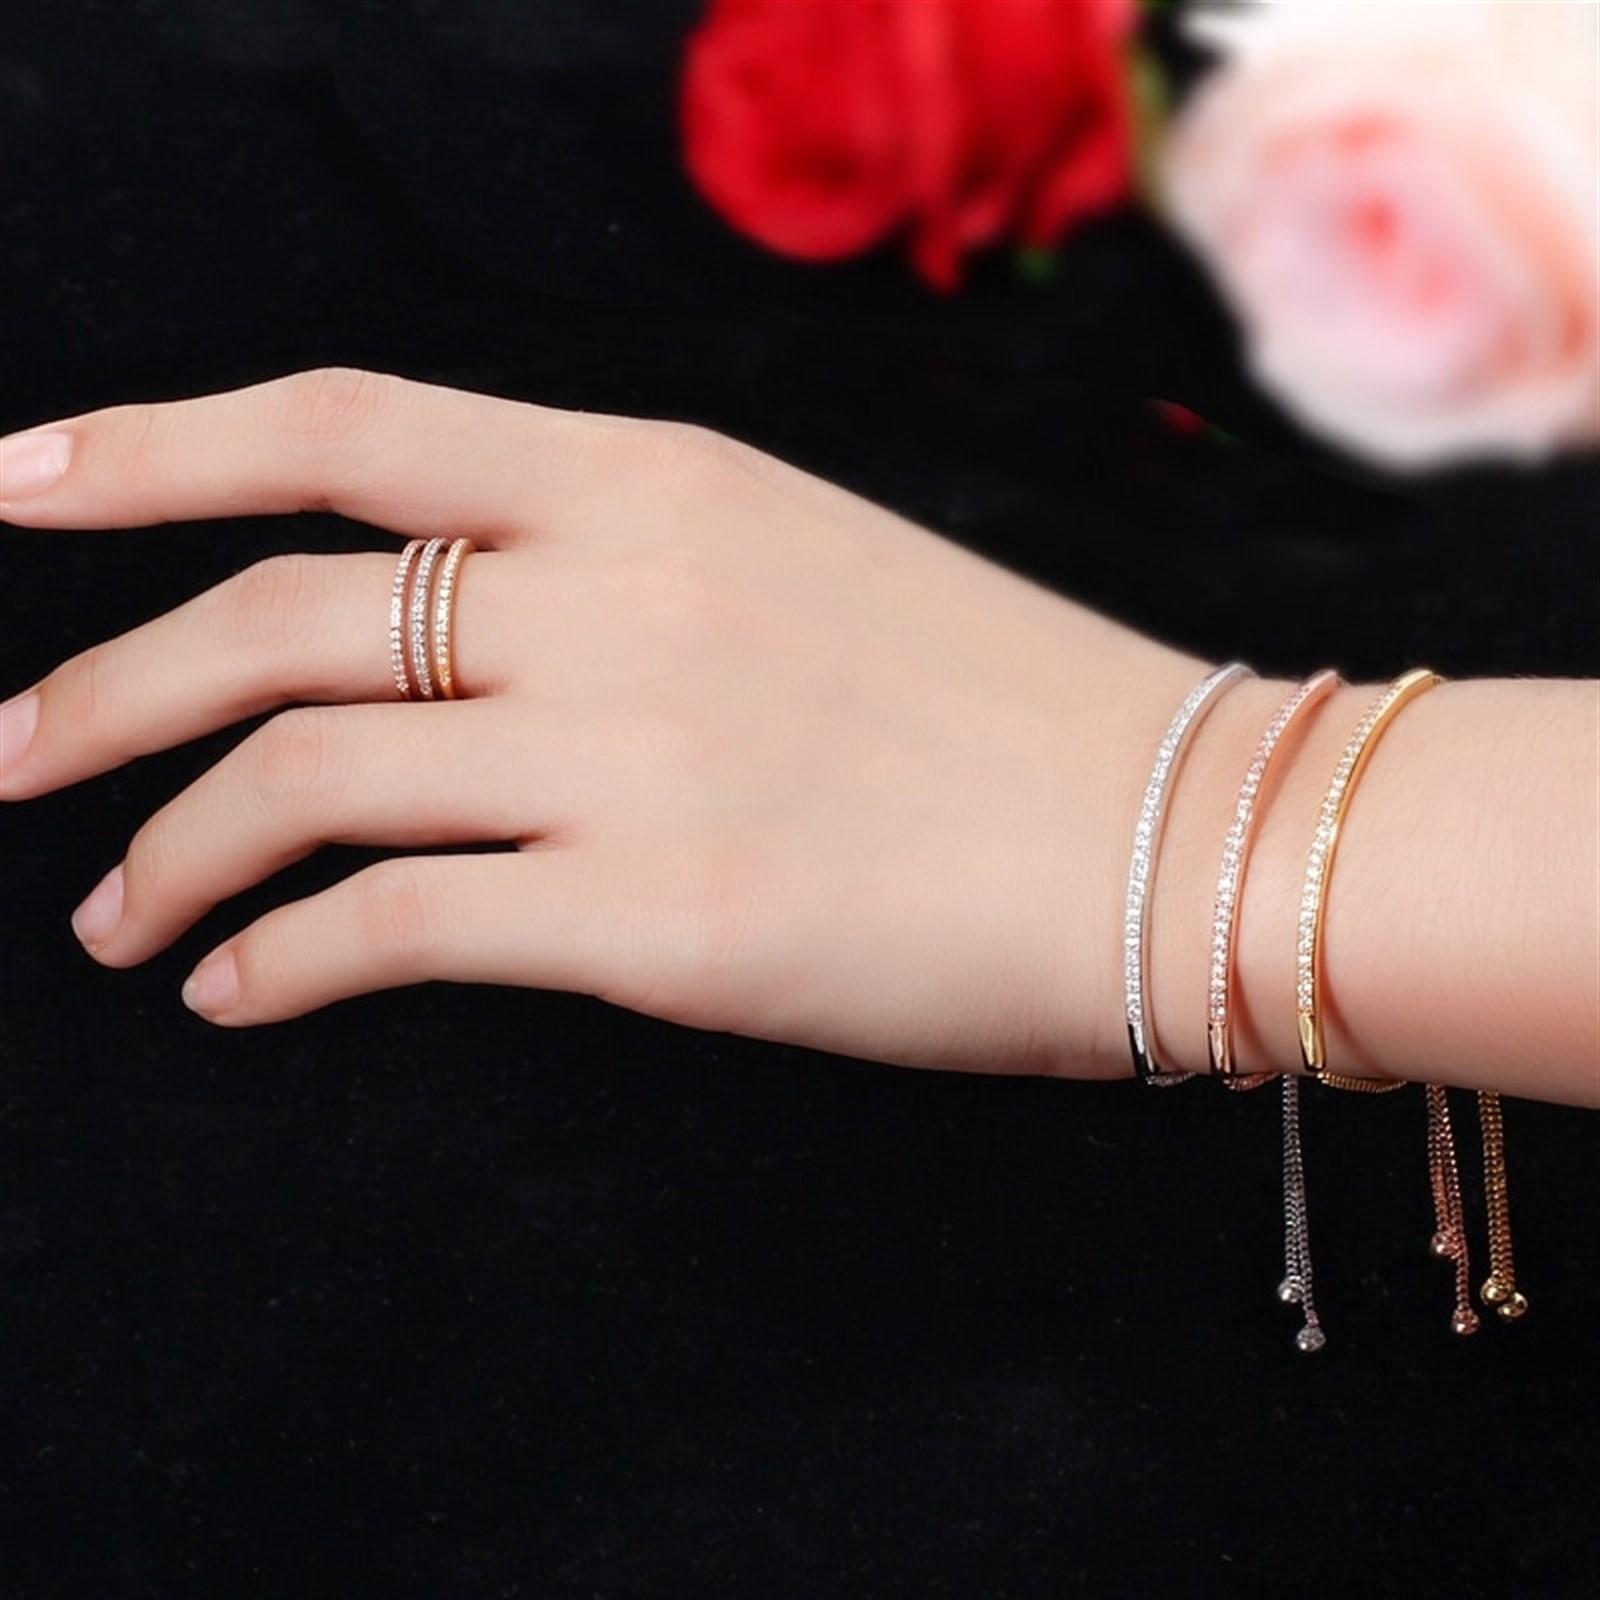 CZ Long Bar Adjustable Bracelet Only $5.99 w/ Free Shipping